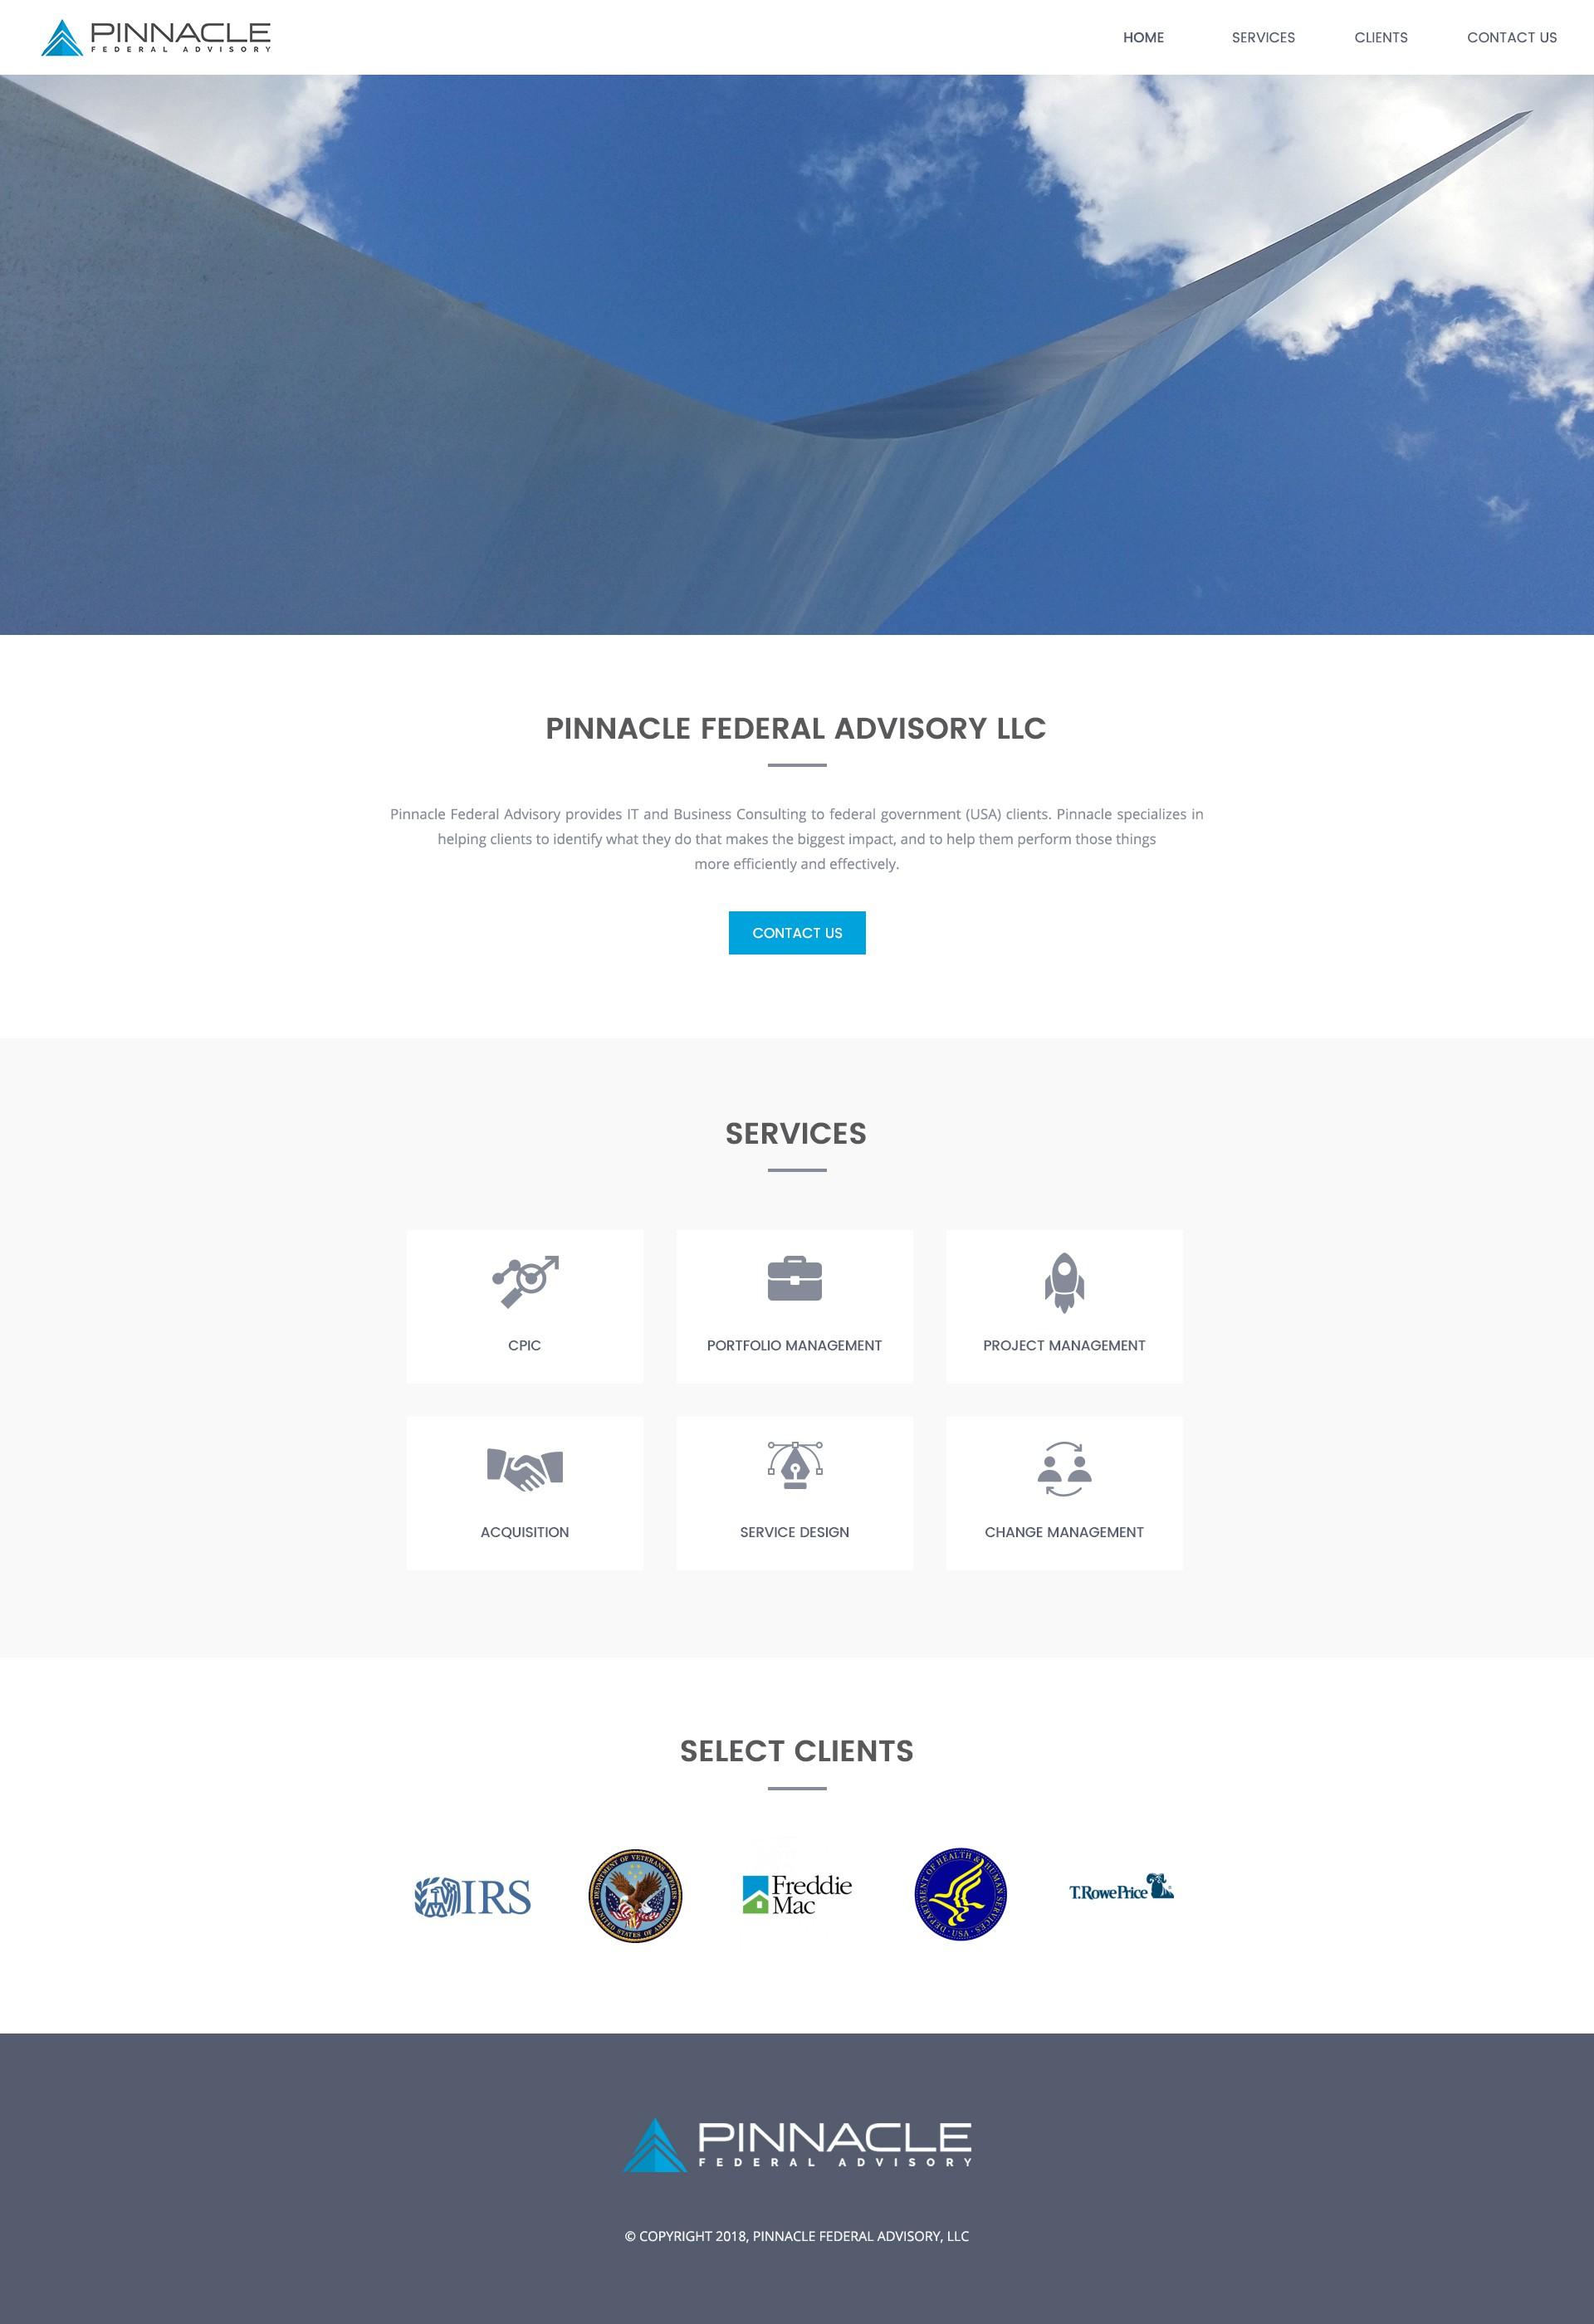 WordPress-based website and hosting